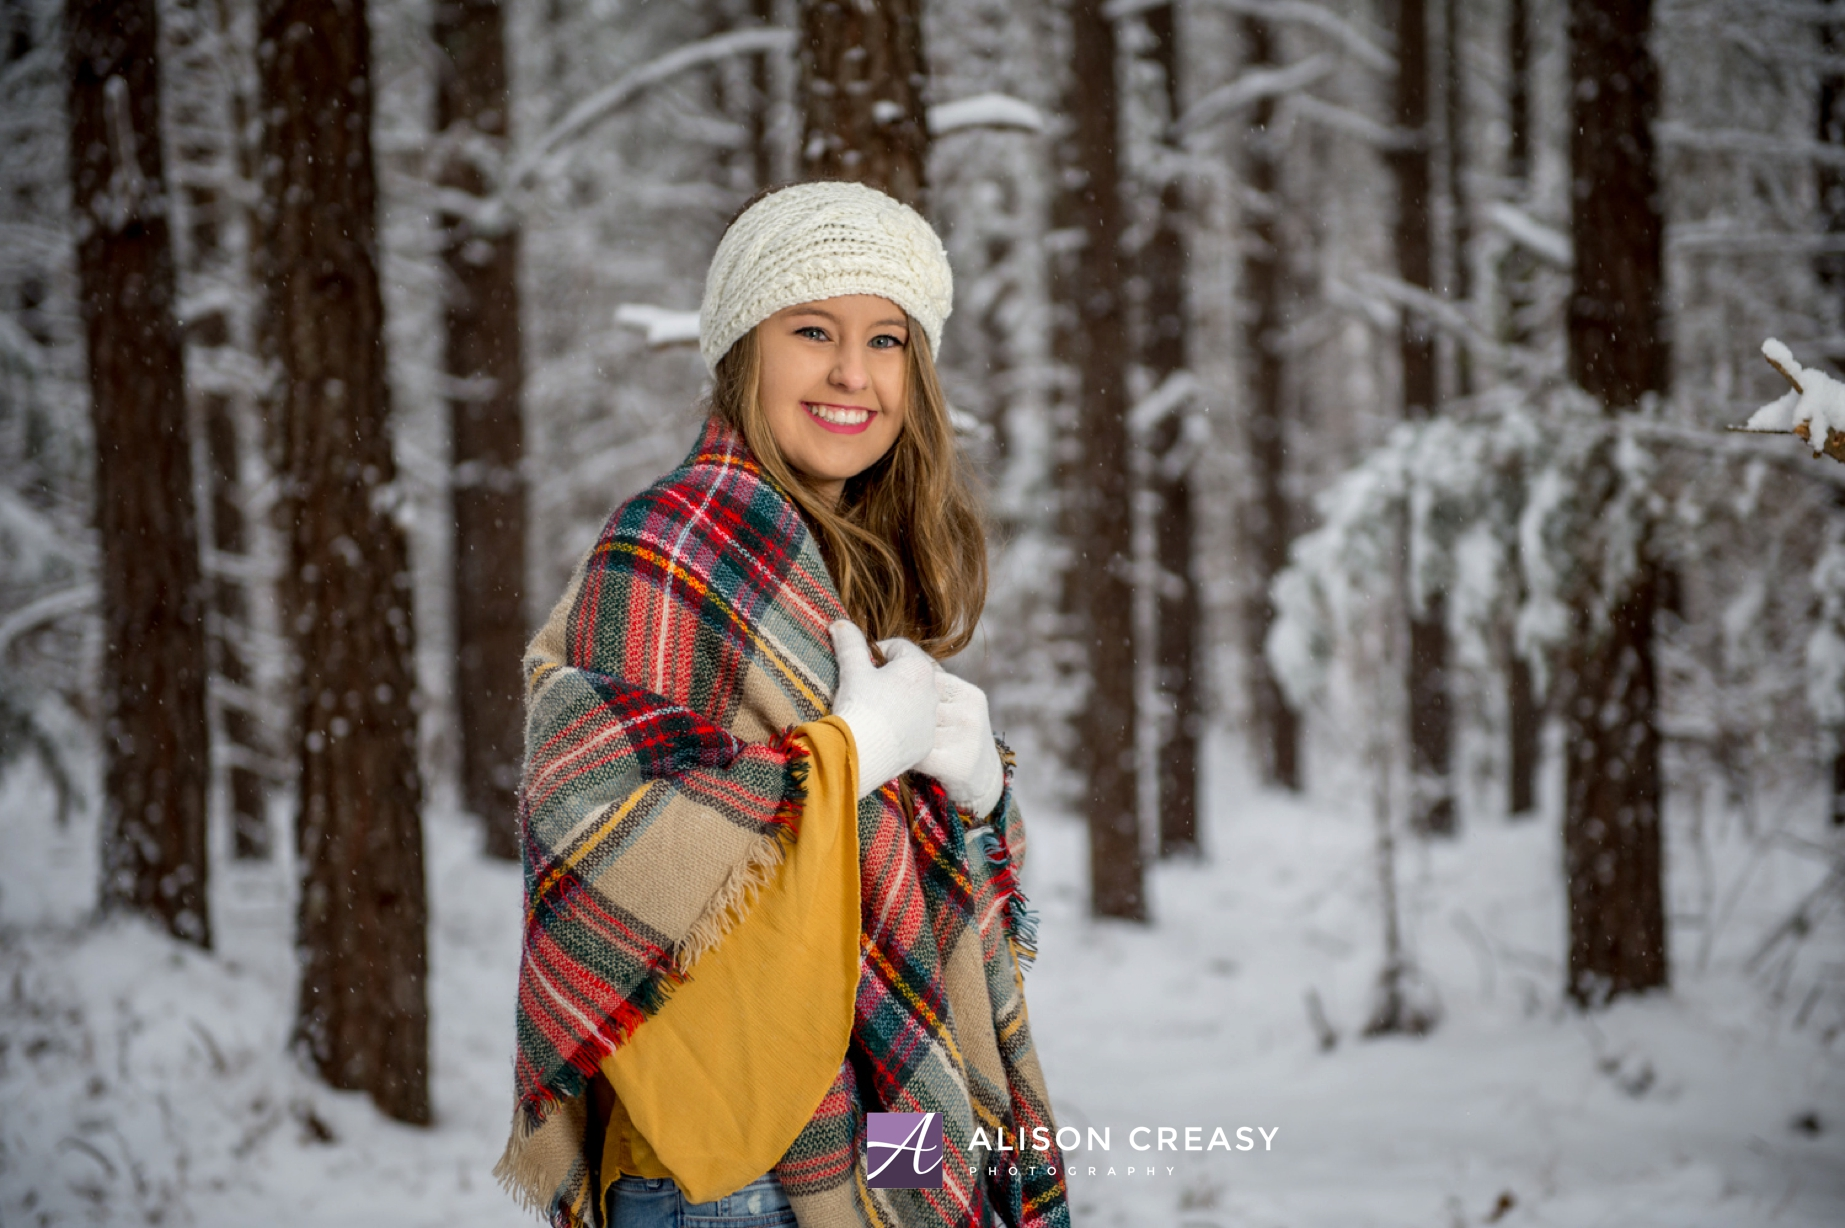 Alison-Creasy-Photography-Lynchburg-VA-Senior-Photographer_0027.jpg